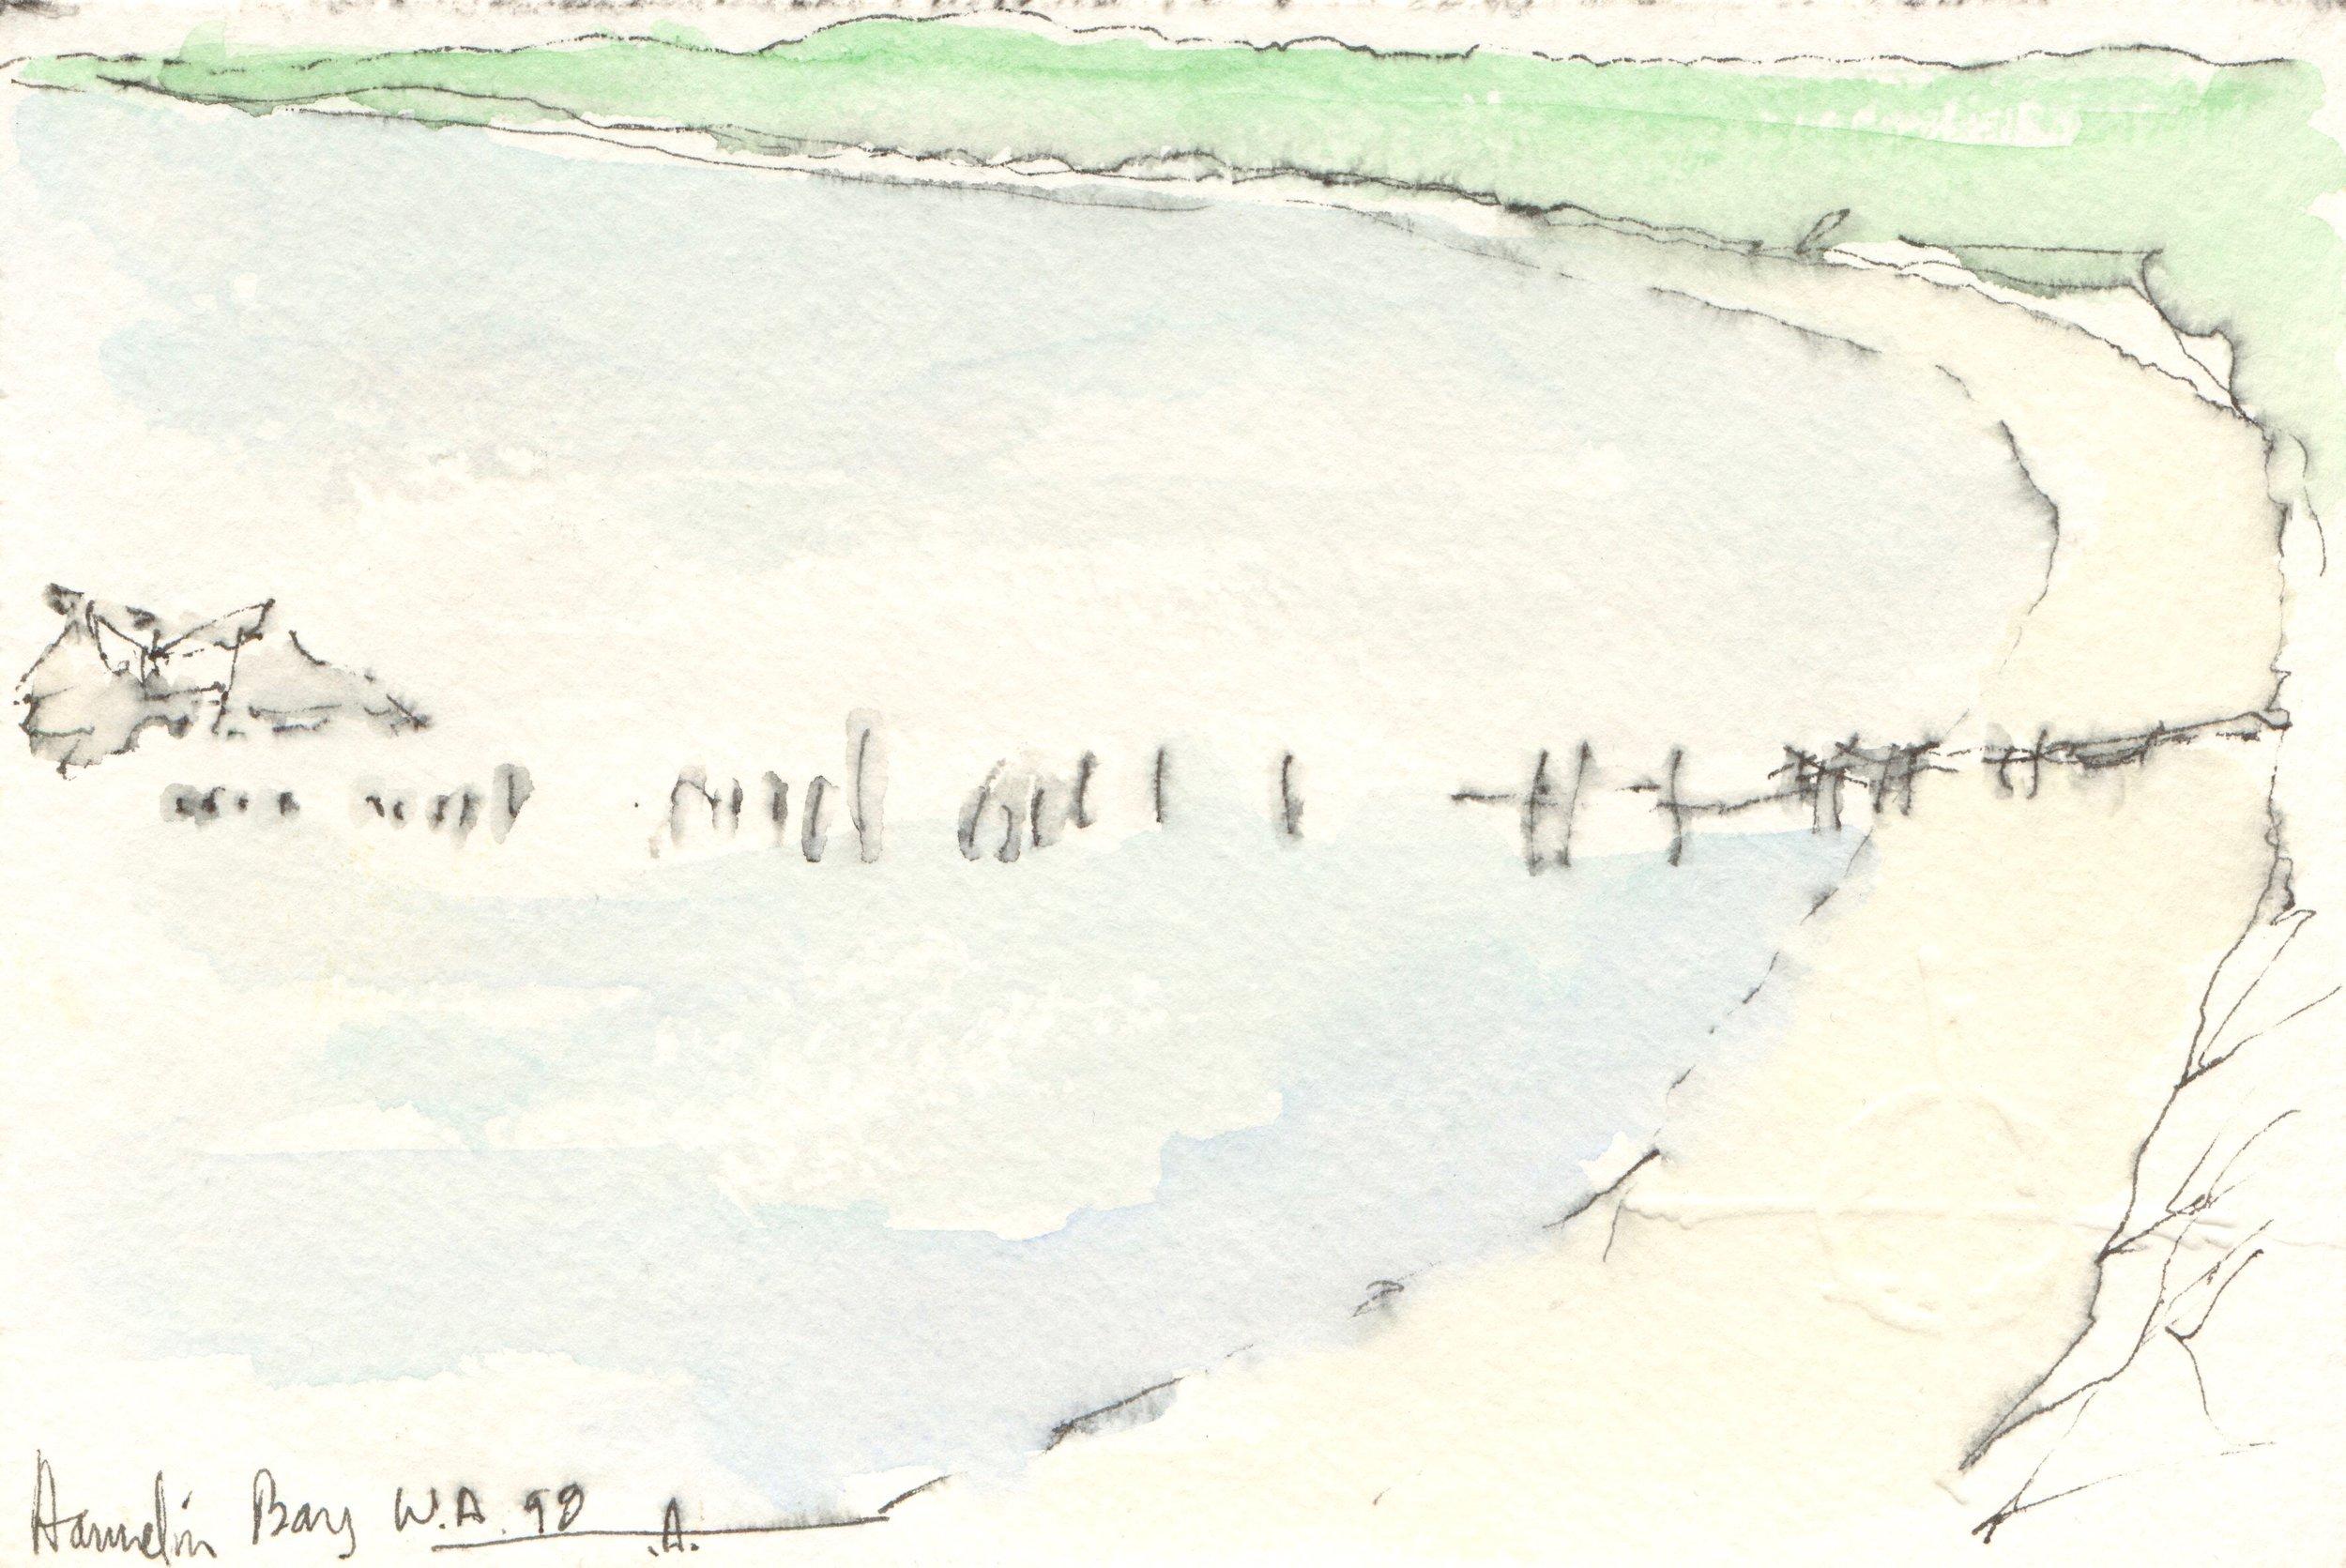 Hamelin Bay 2, W.A. 98-181211-0006.jpg